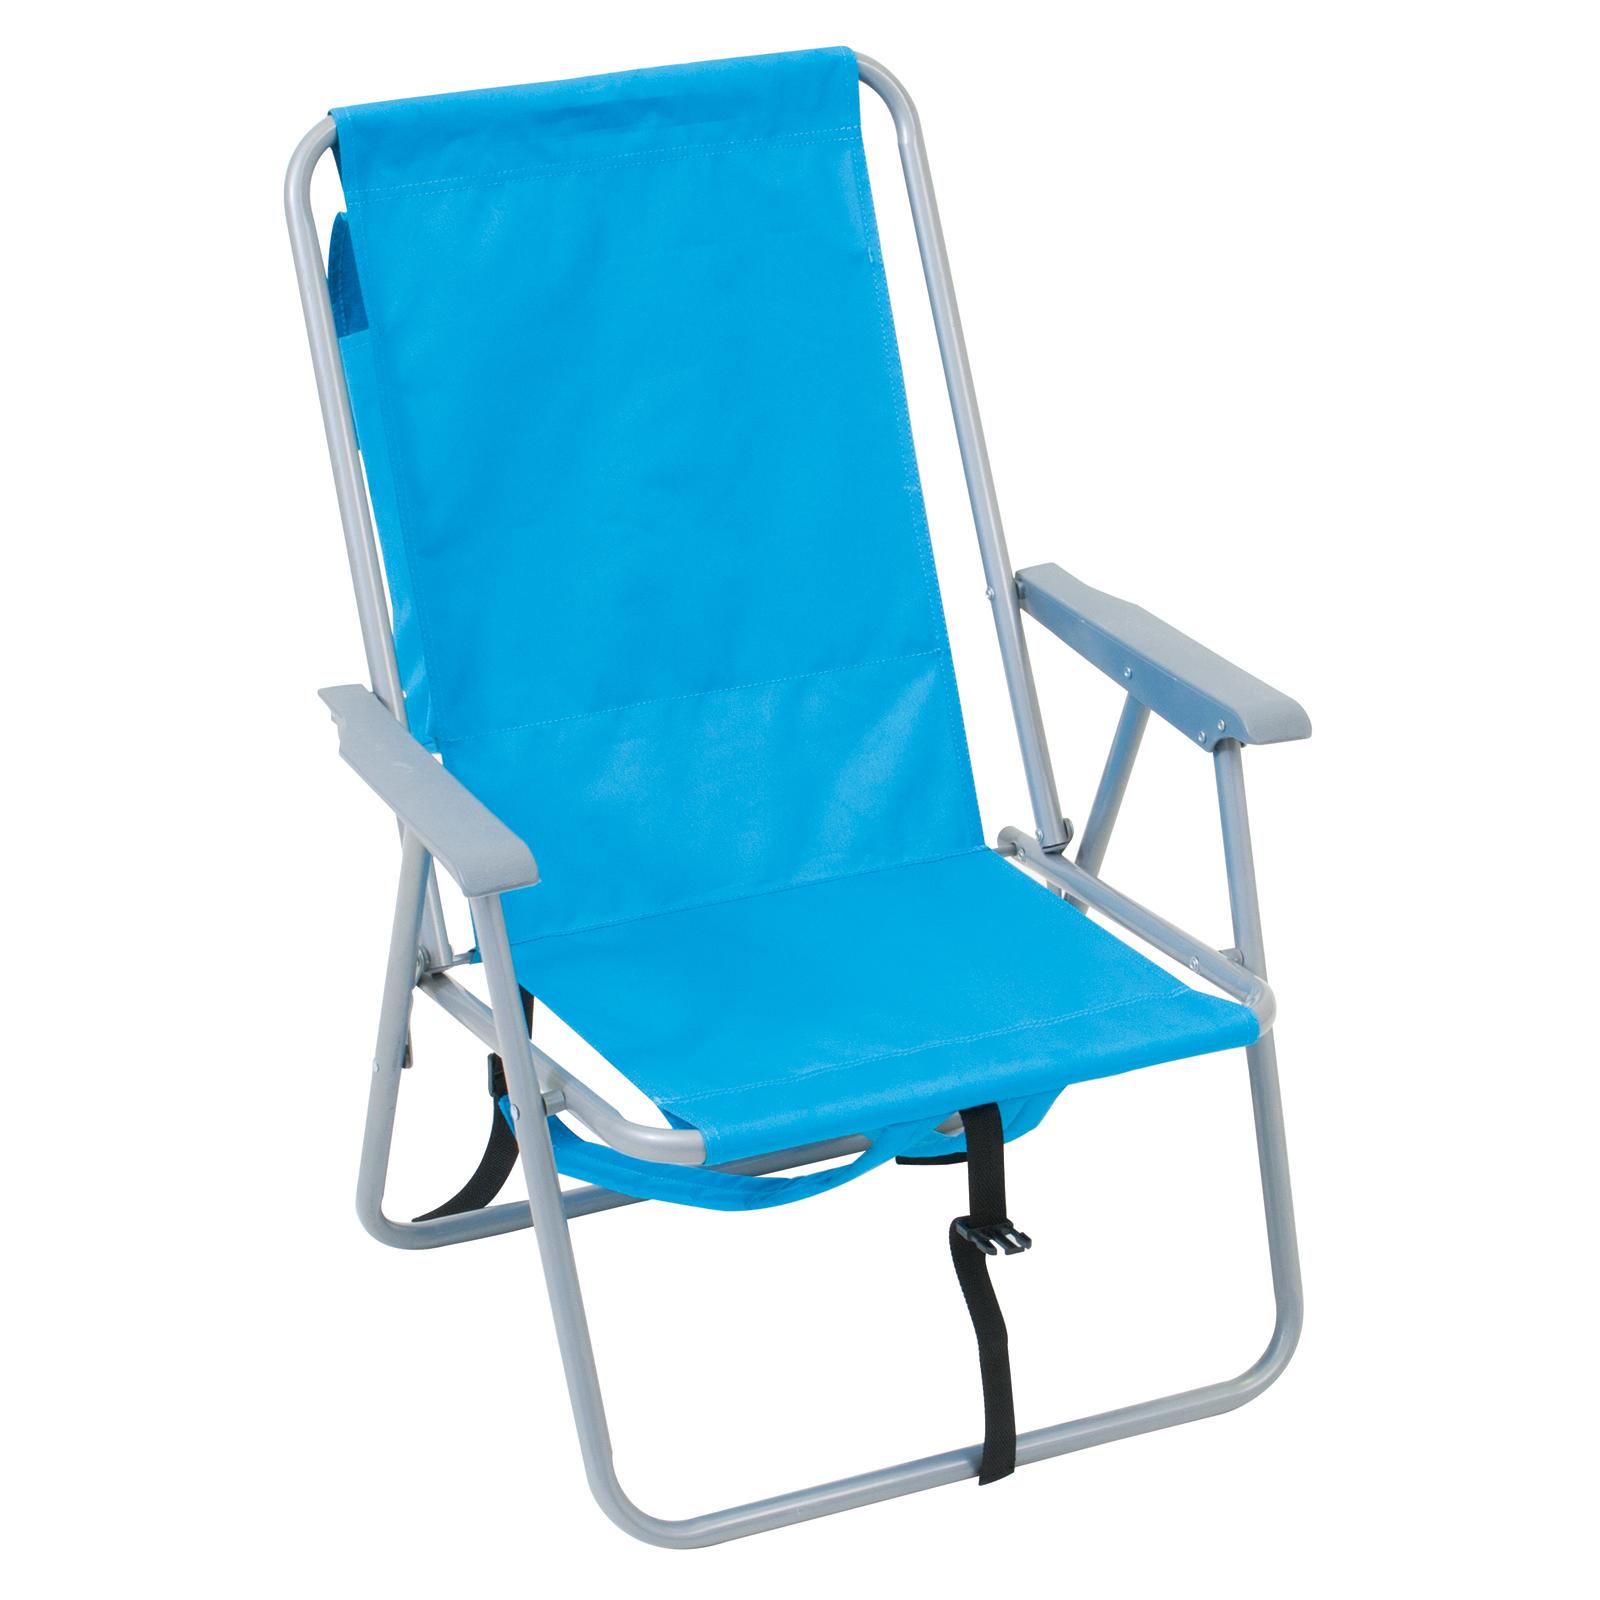 Gear Basic Backpack Chair